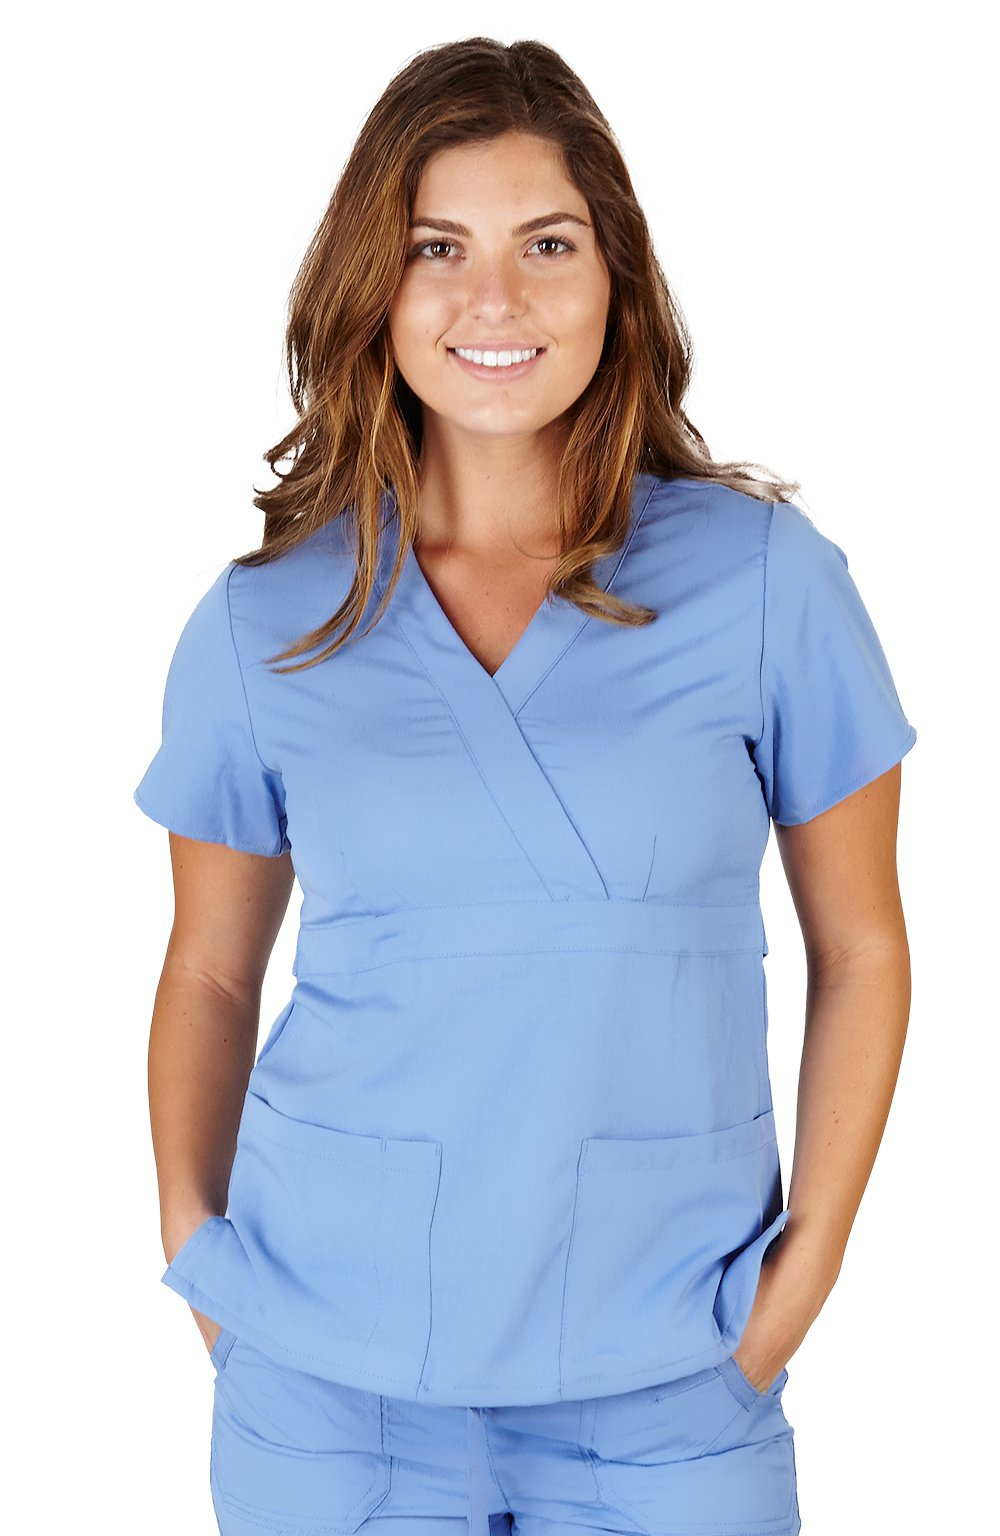 Ultra Soft Brand Scrubs - Premium Womens Junior Fit 3 Pocket Mock Wrap Scrub Top, Ceil Blue 36143-Large